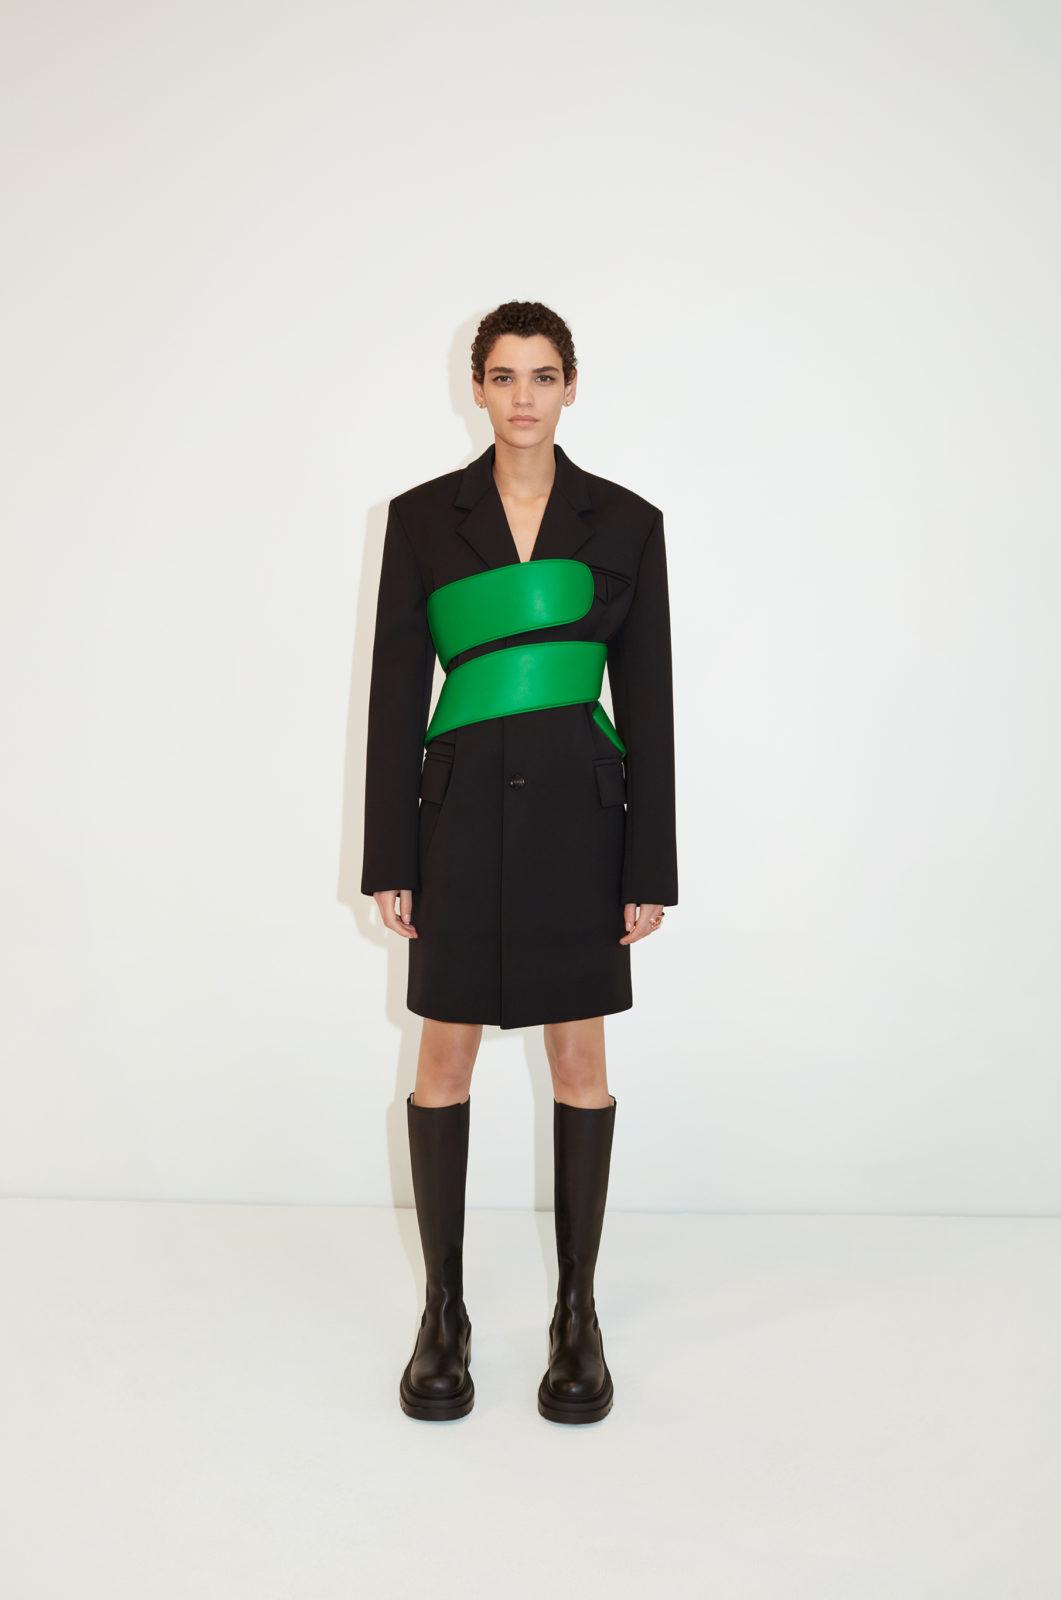 Bottega Veneta Wardrobe 02 - Look 17